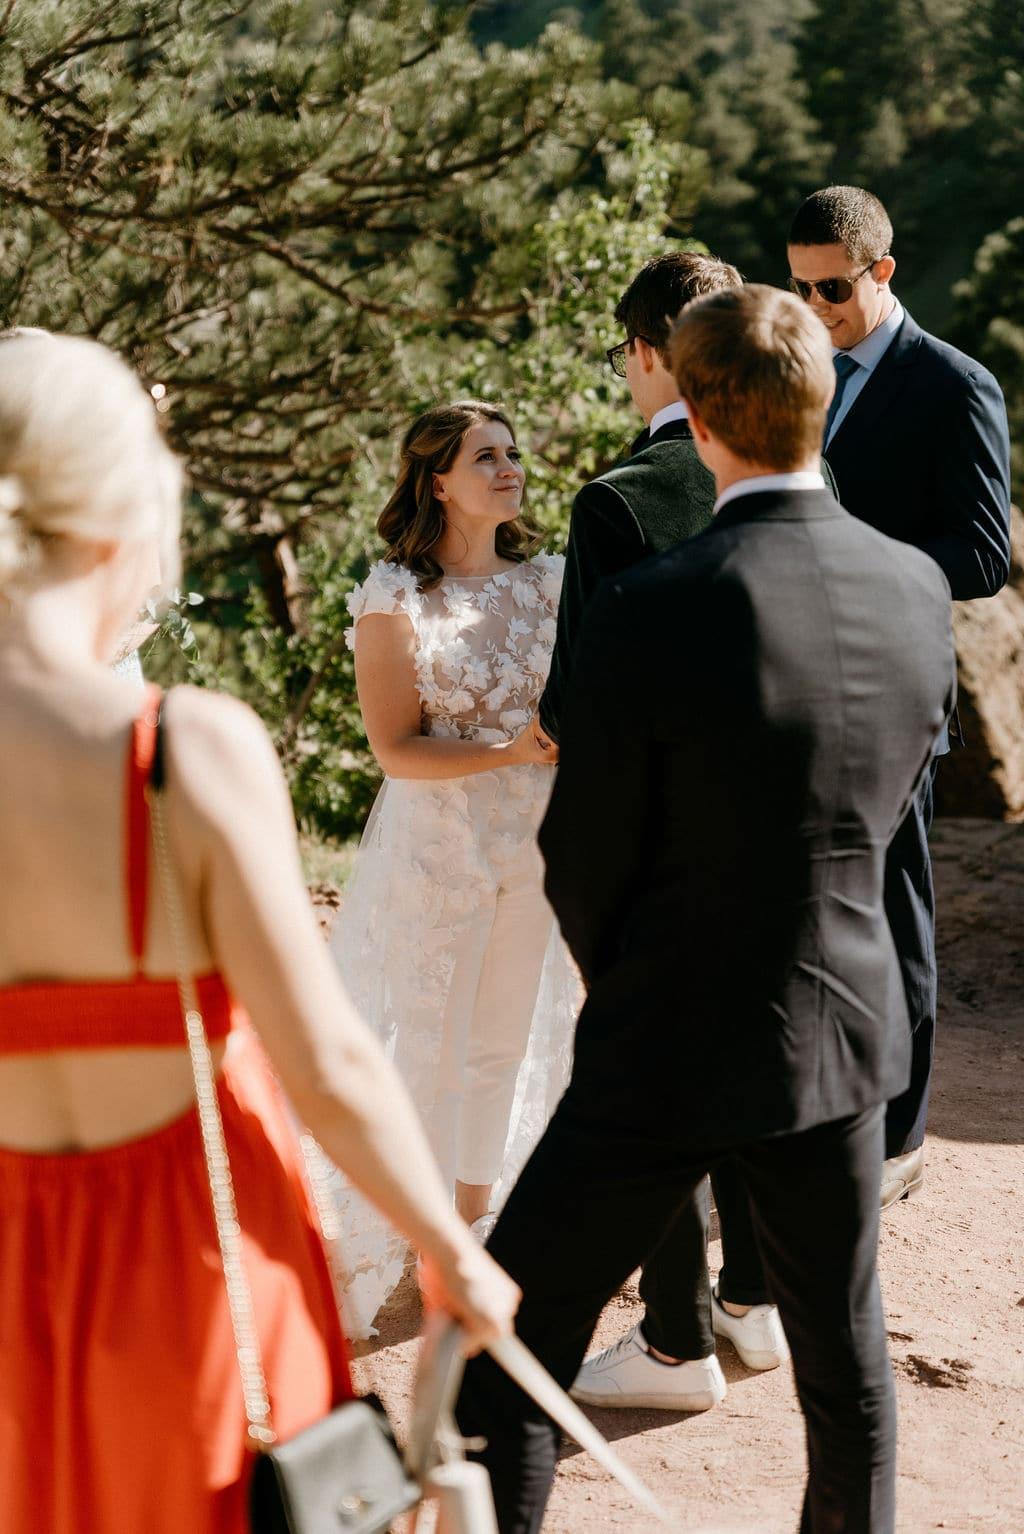 Settlers Park wedding In Boulder Colorado